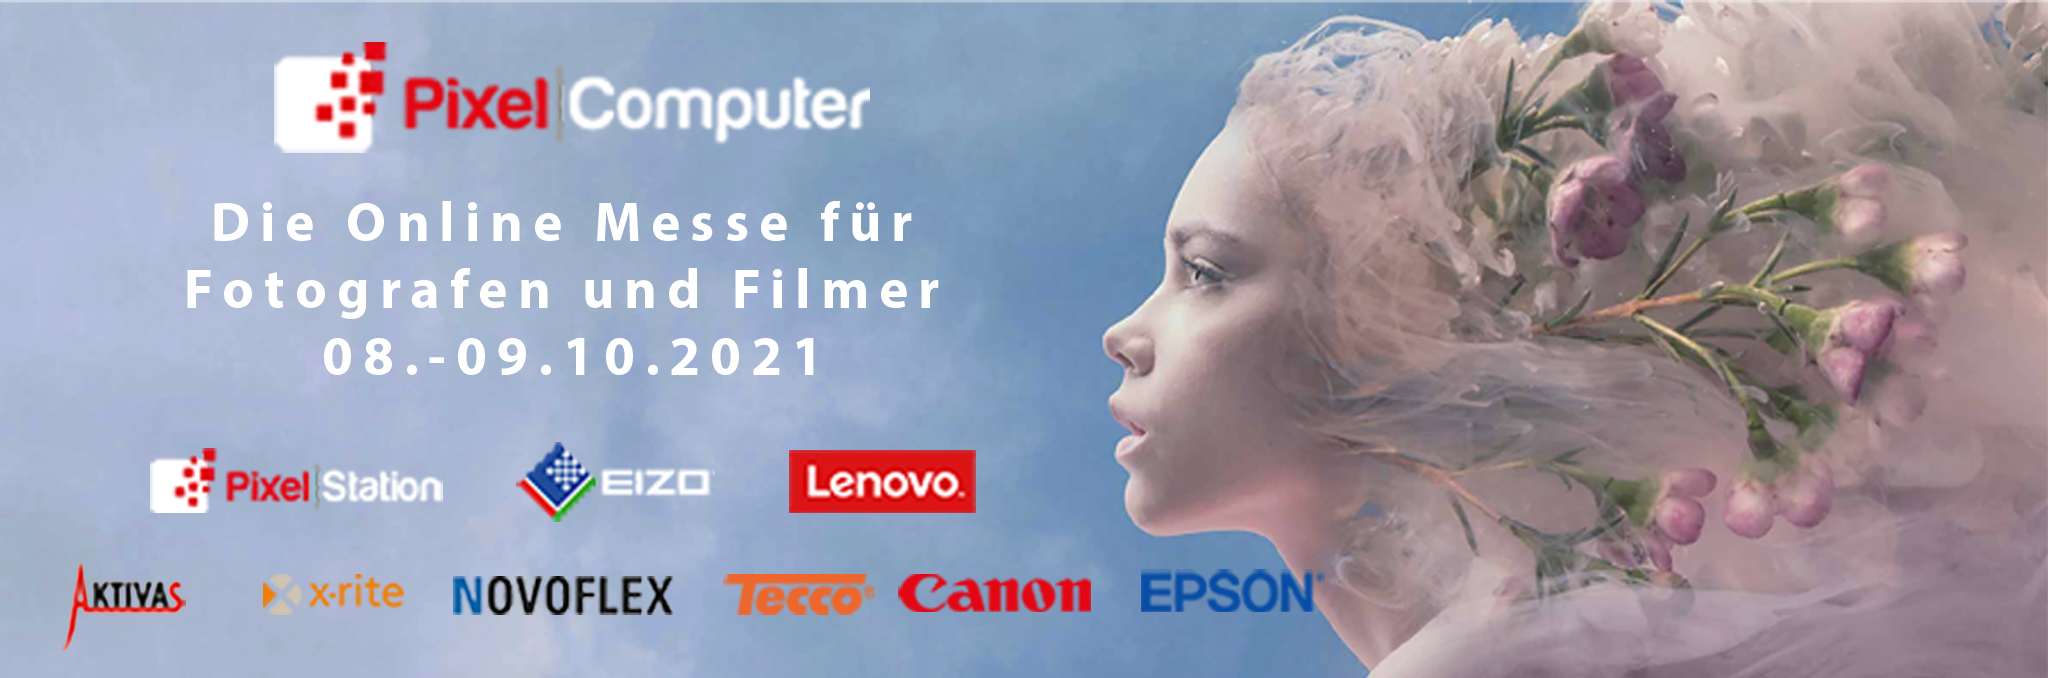 Pixelcomputer-Onlinemesse